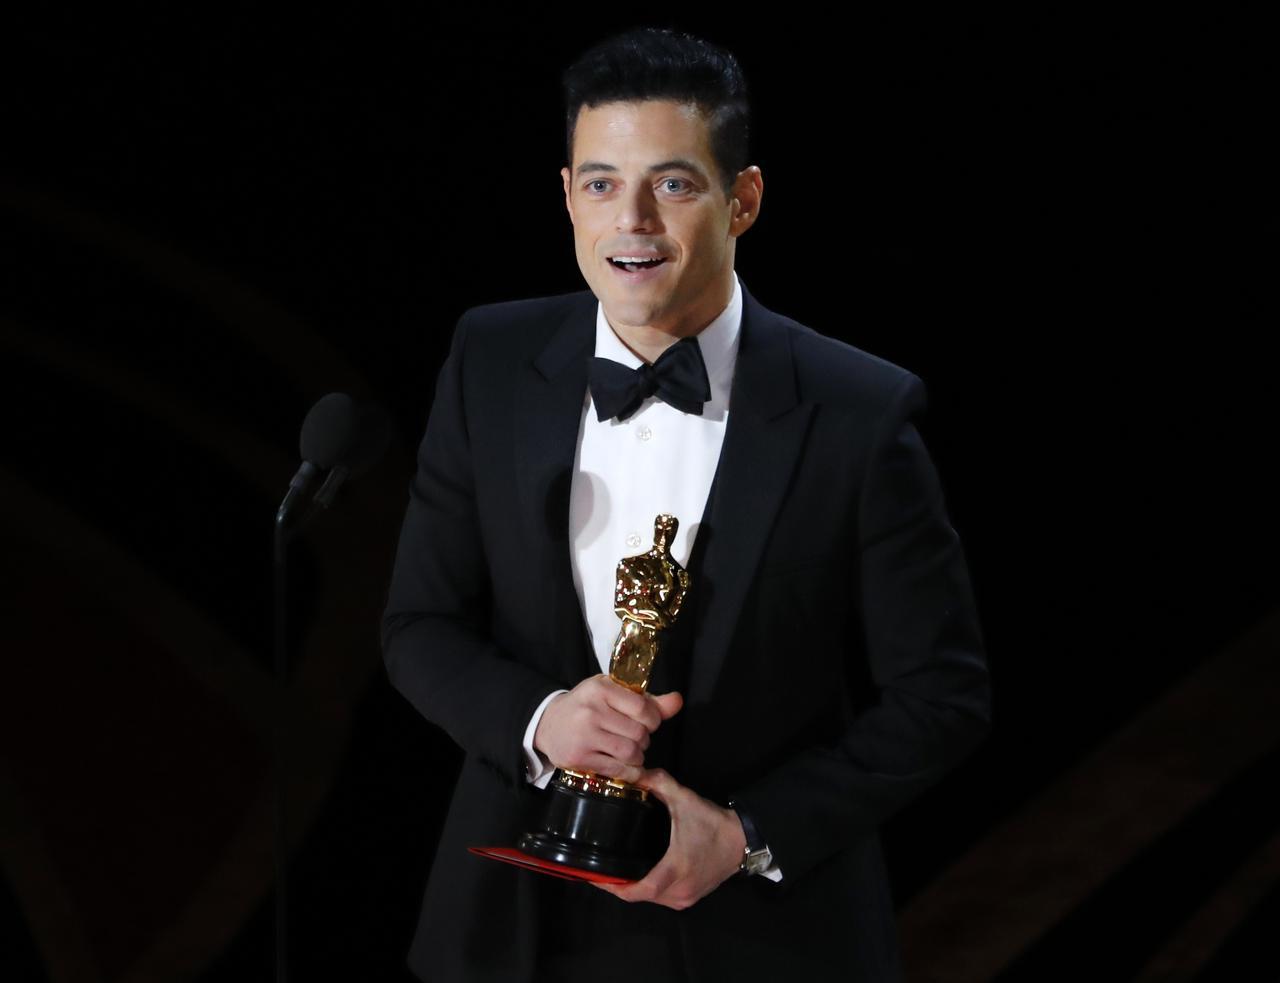 What Does Oscar Mike Mean >> Rami Malek Wins Best Actor Oscar For Bohemian Rhapsody